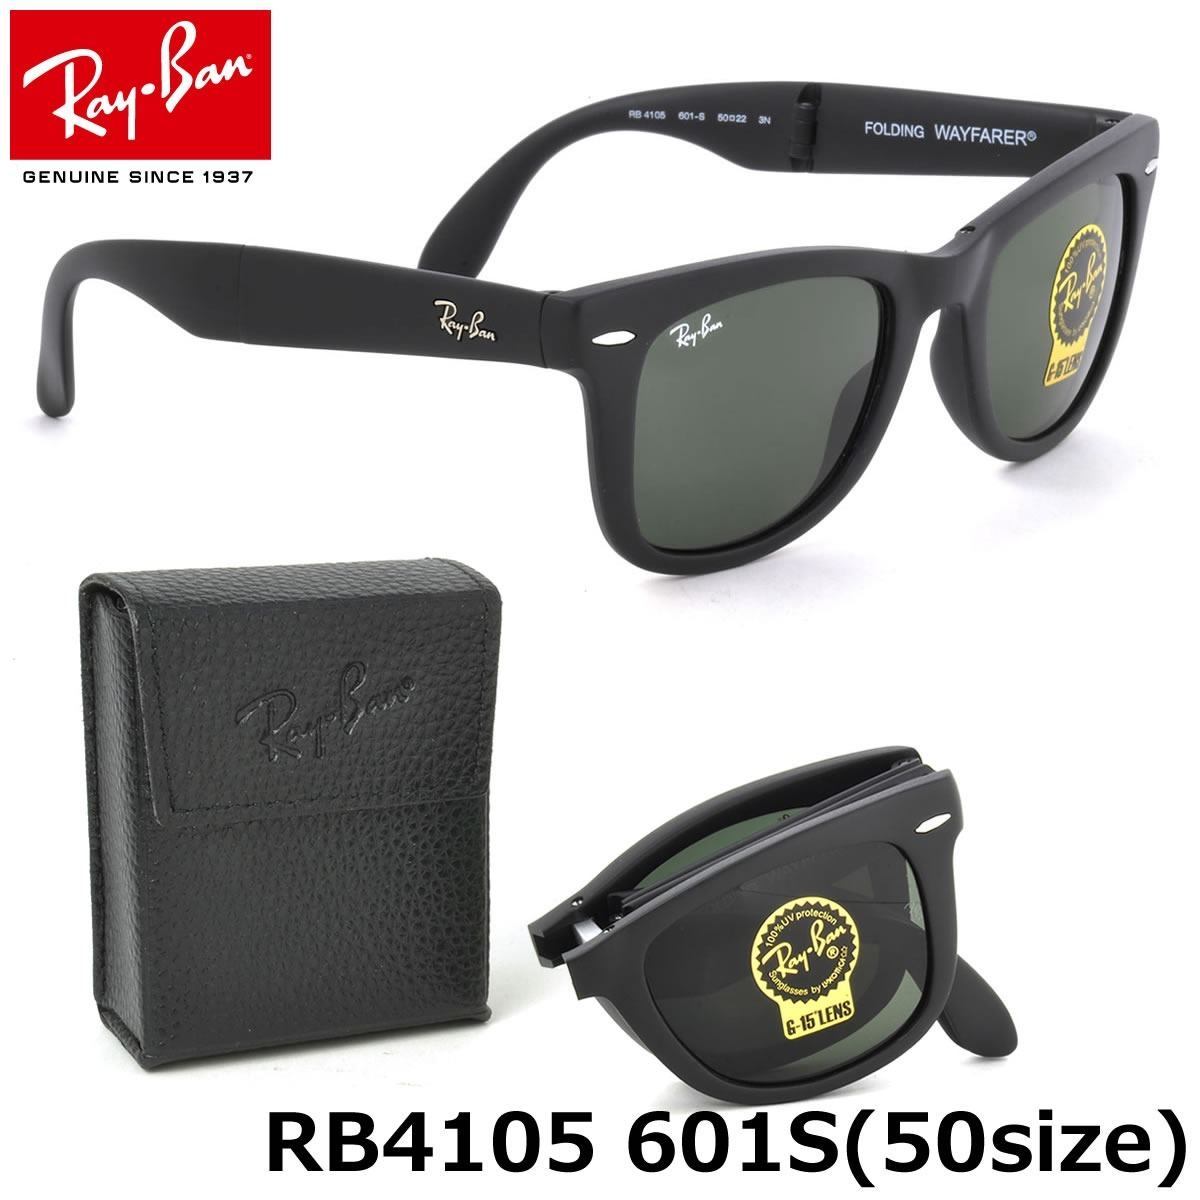 943bc70d7a783 oculos de sol ray ban wayfarer dobravel folding rb4105 uniss. Carregando  zoom.